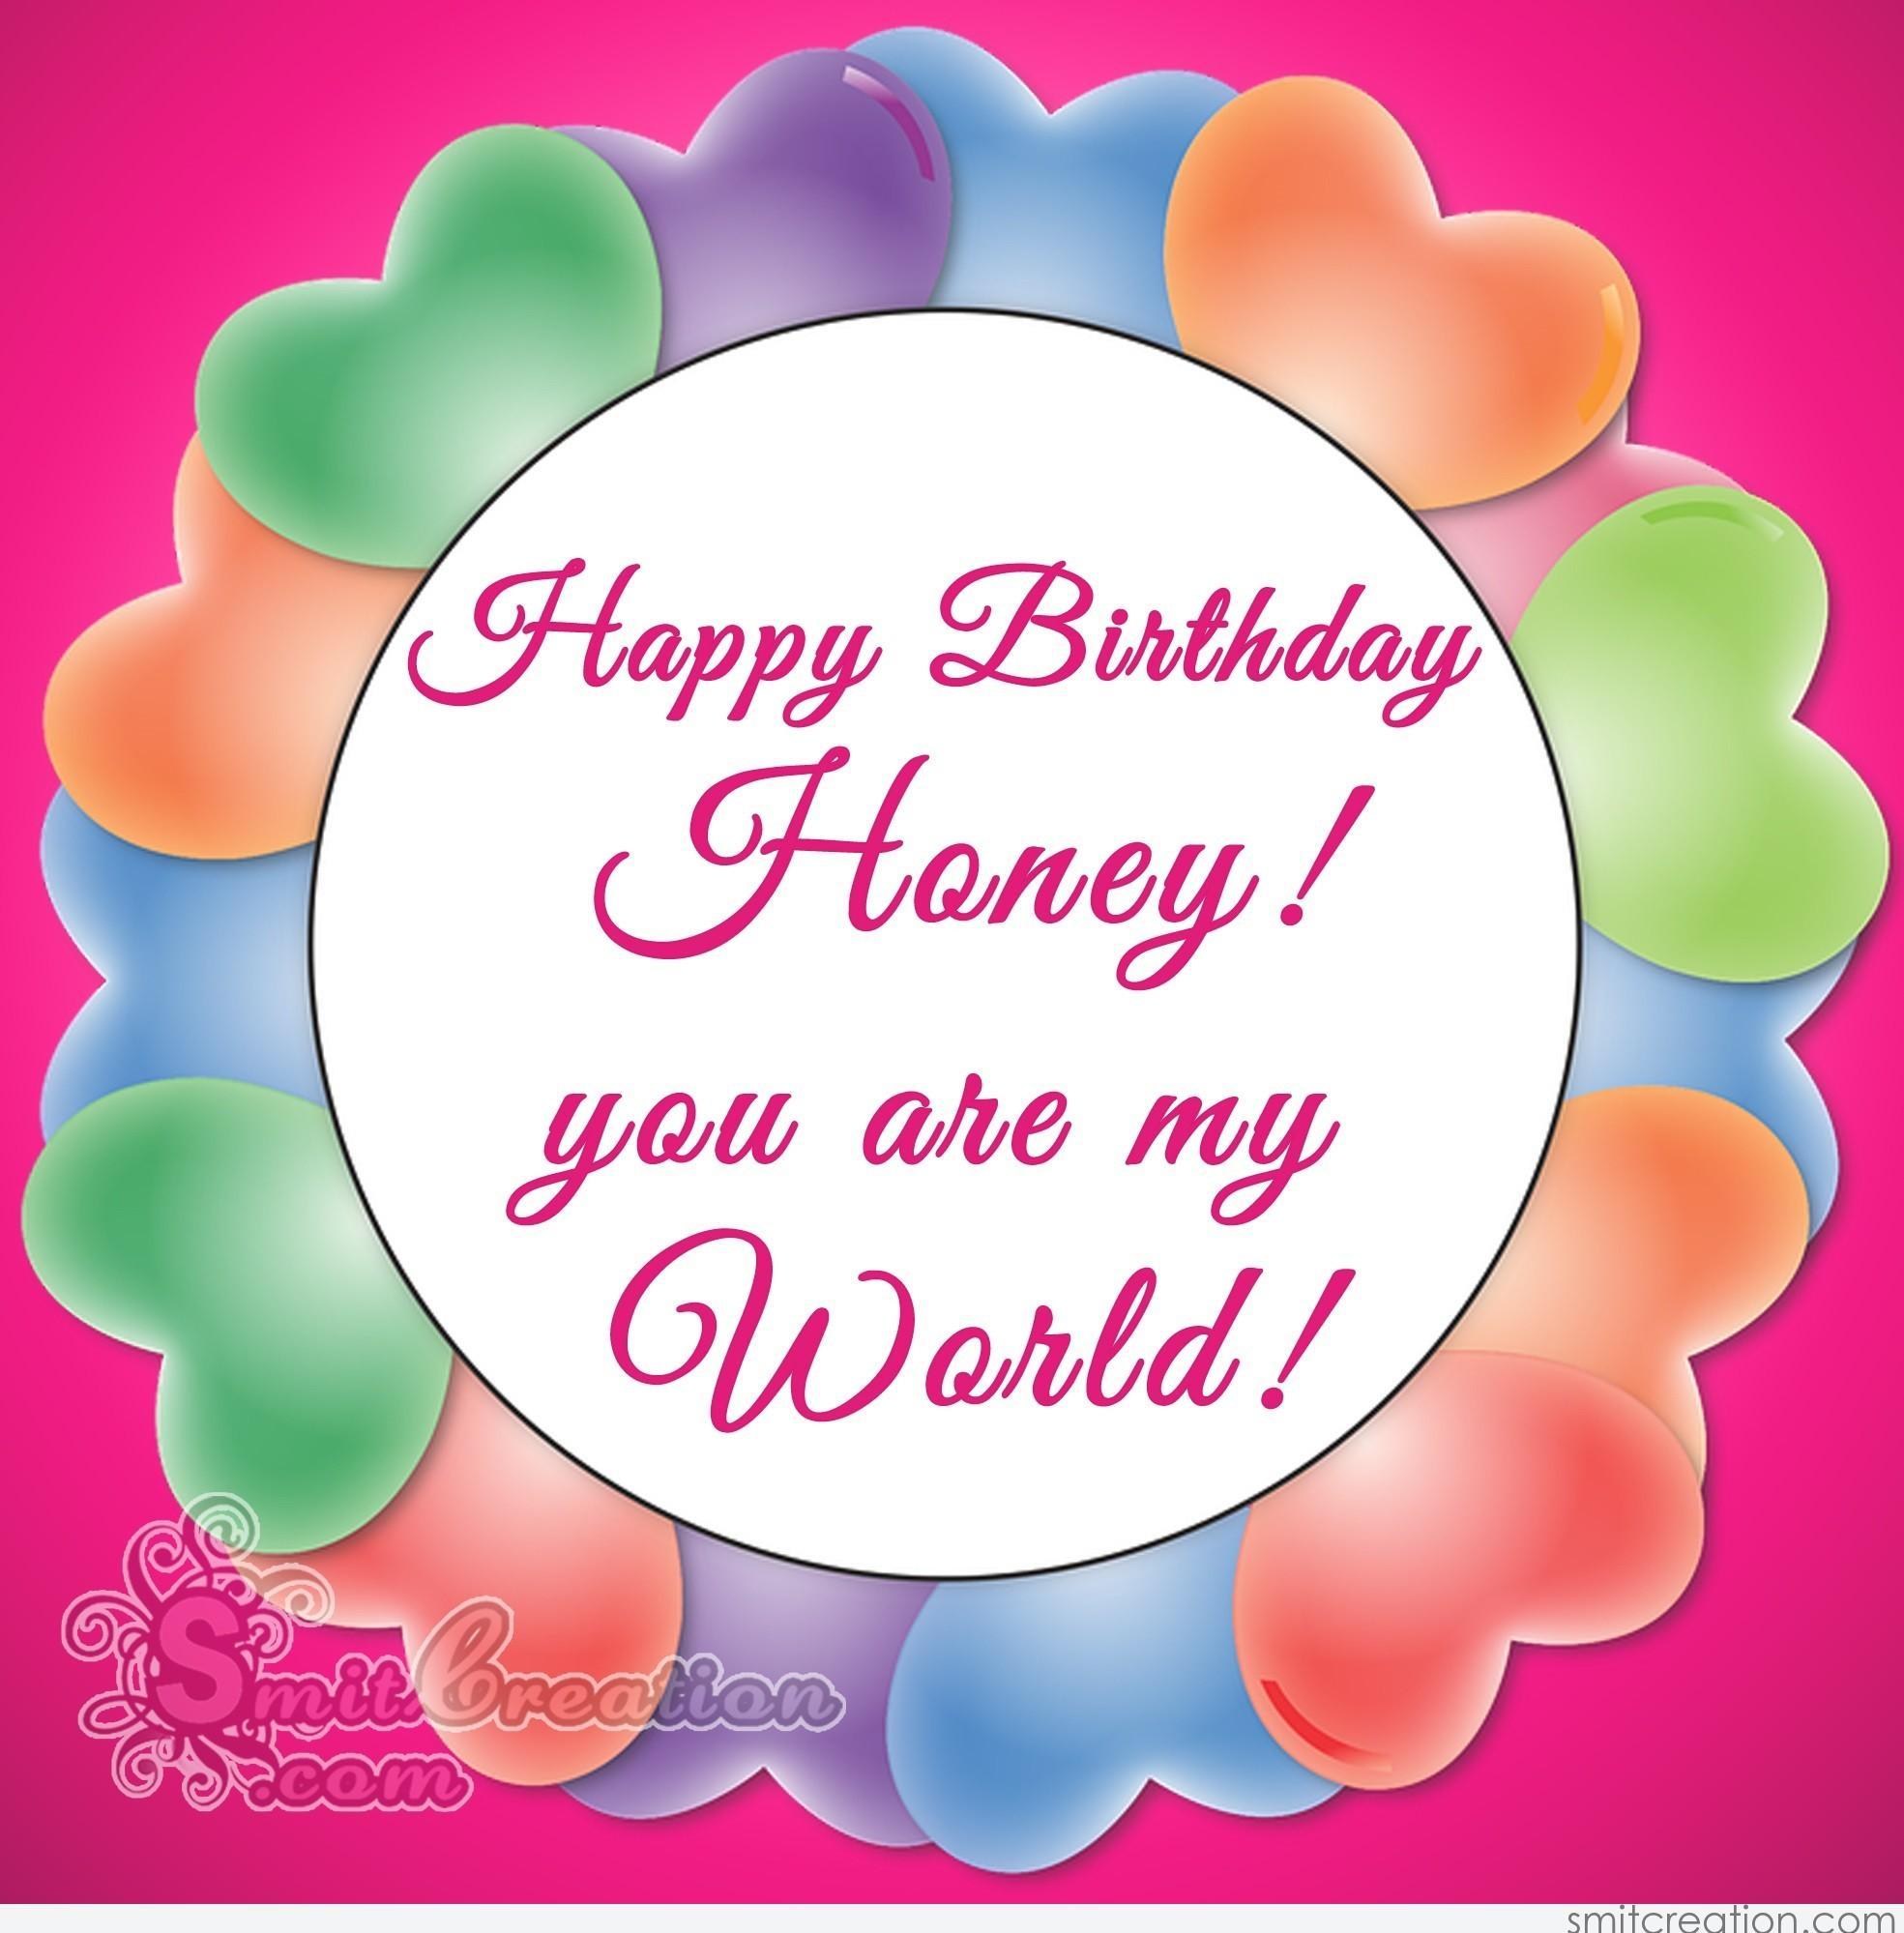 Happy Birthday Honey You Are My World Smitcreation Com